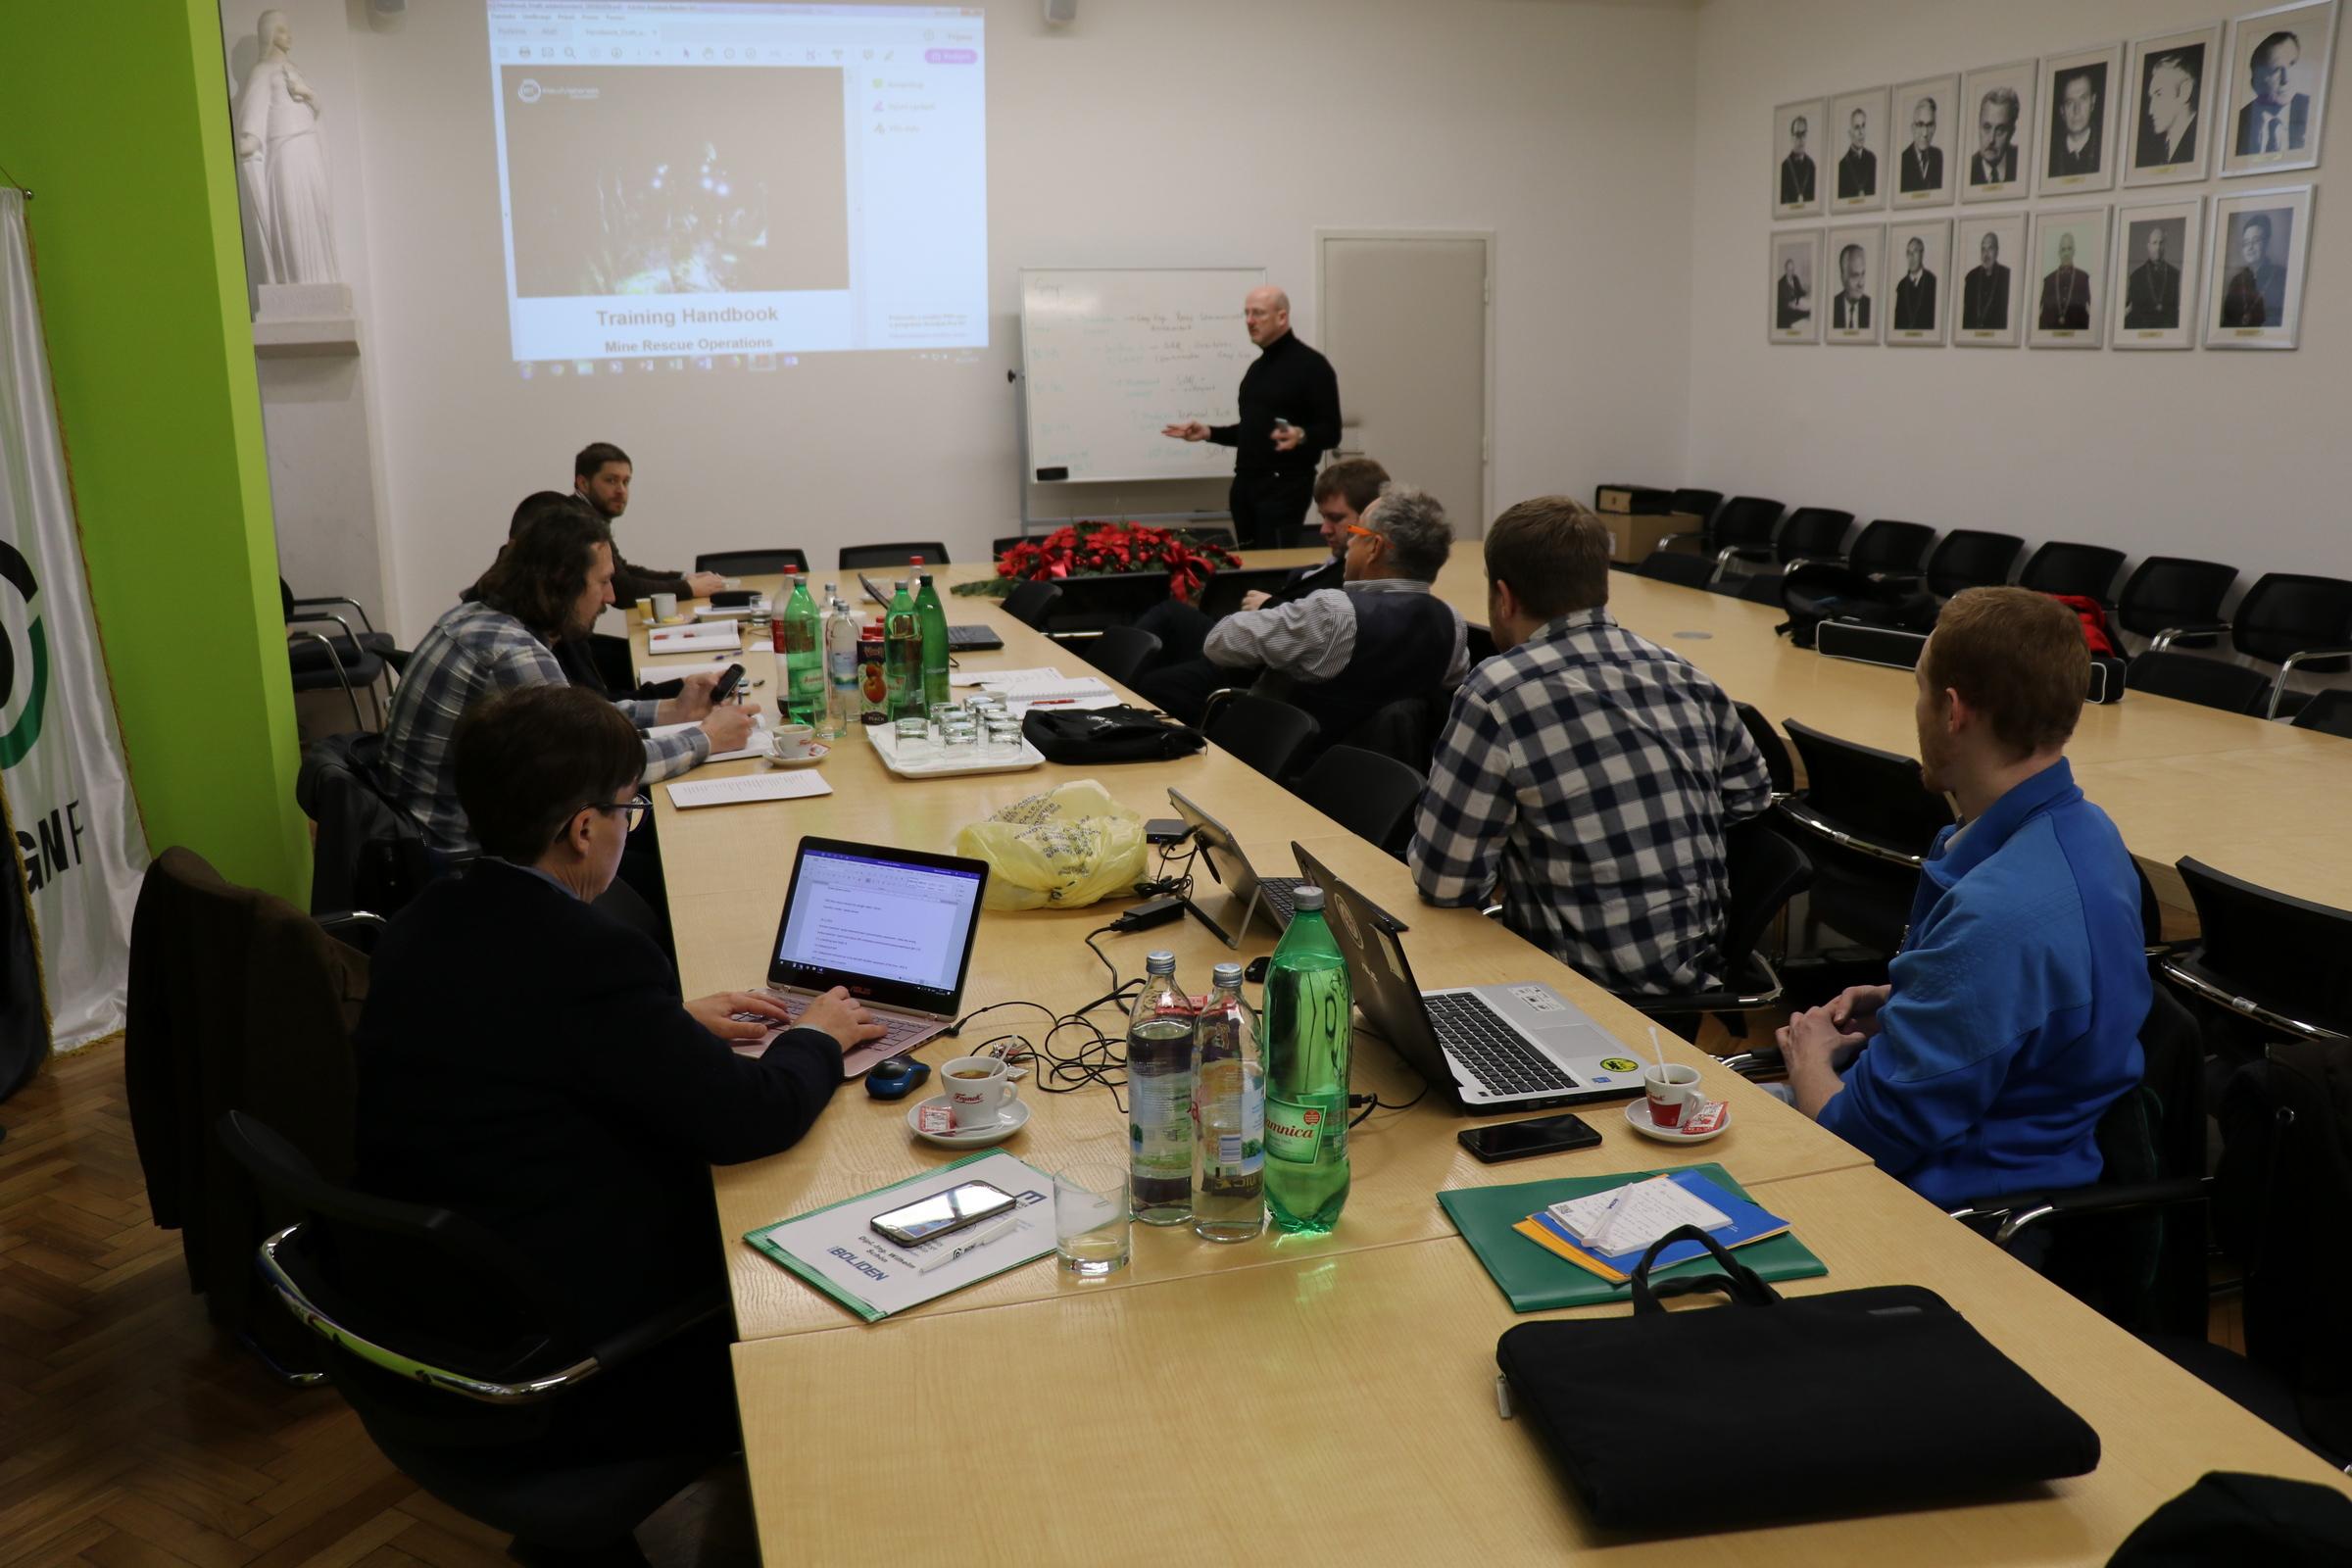 Online upoznavanje vs sastanak osobno